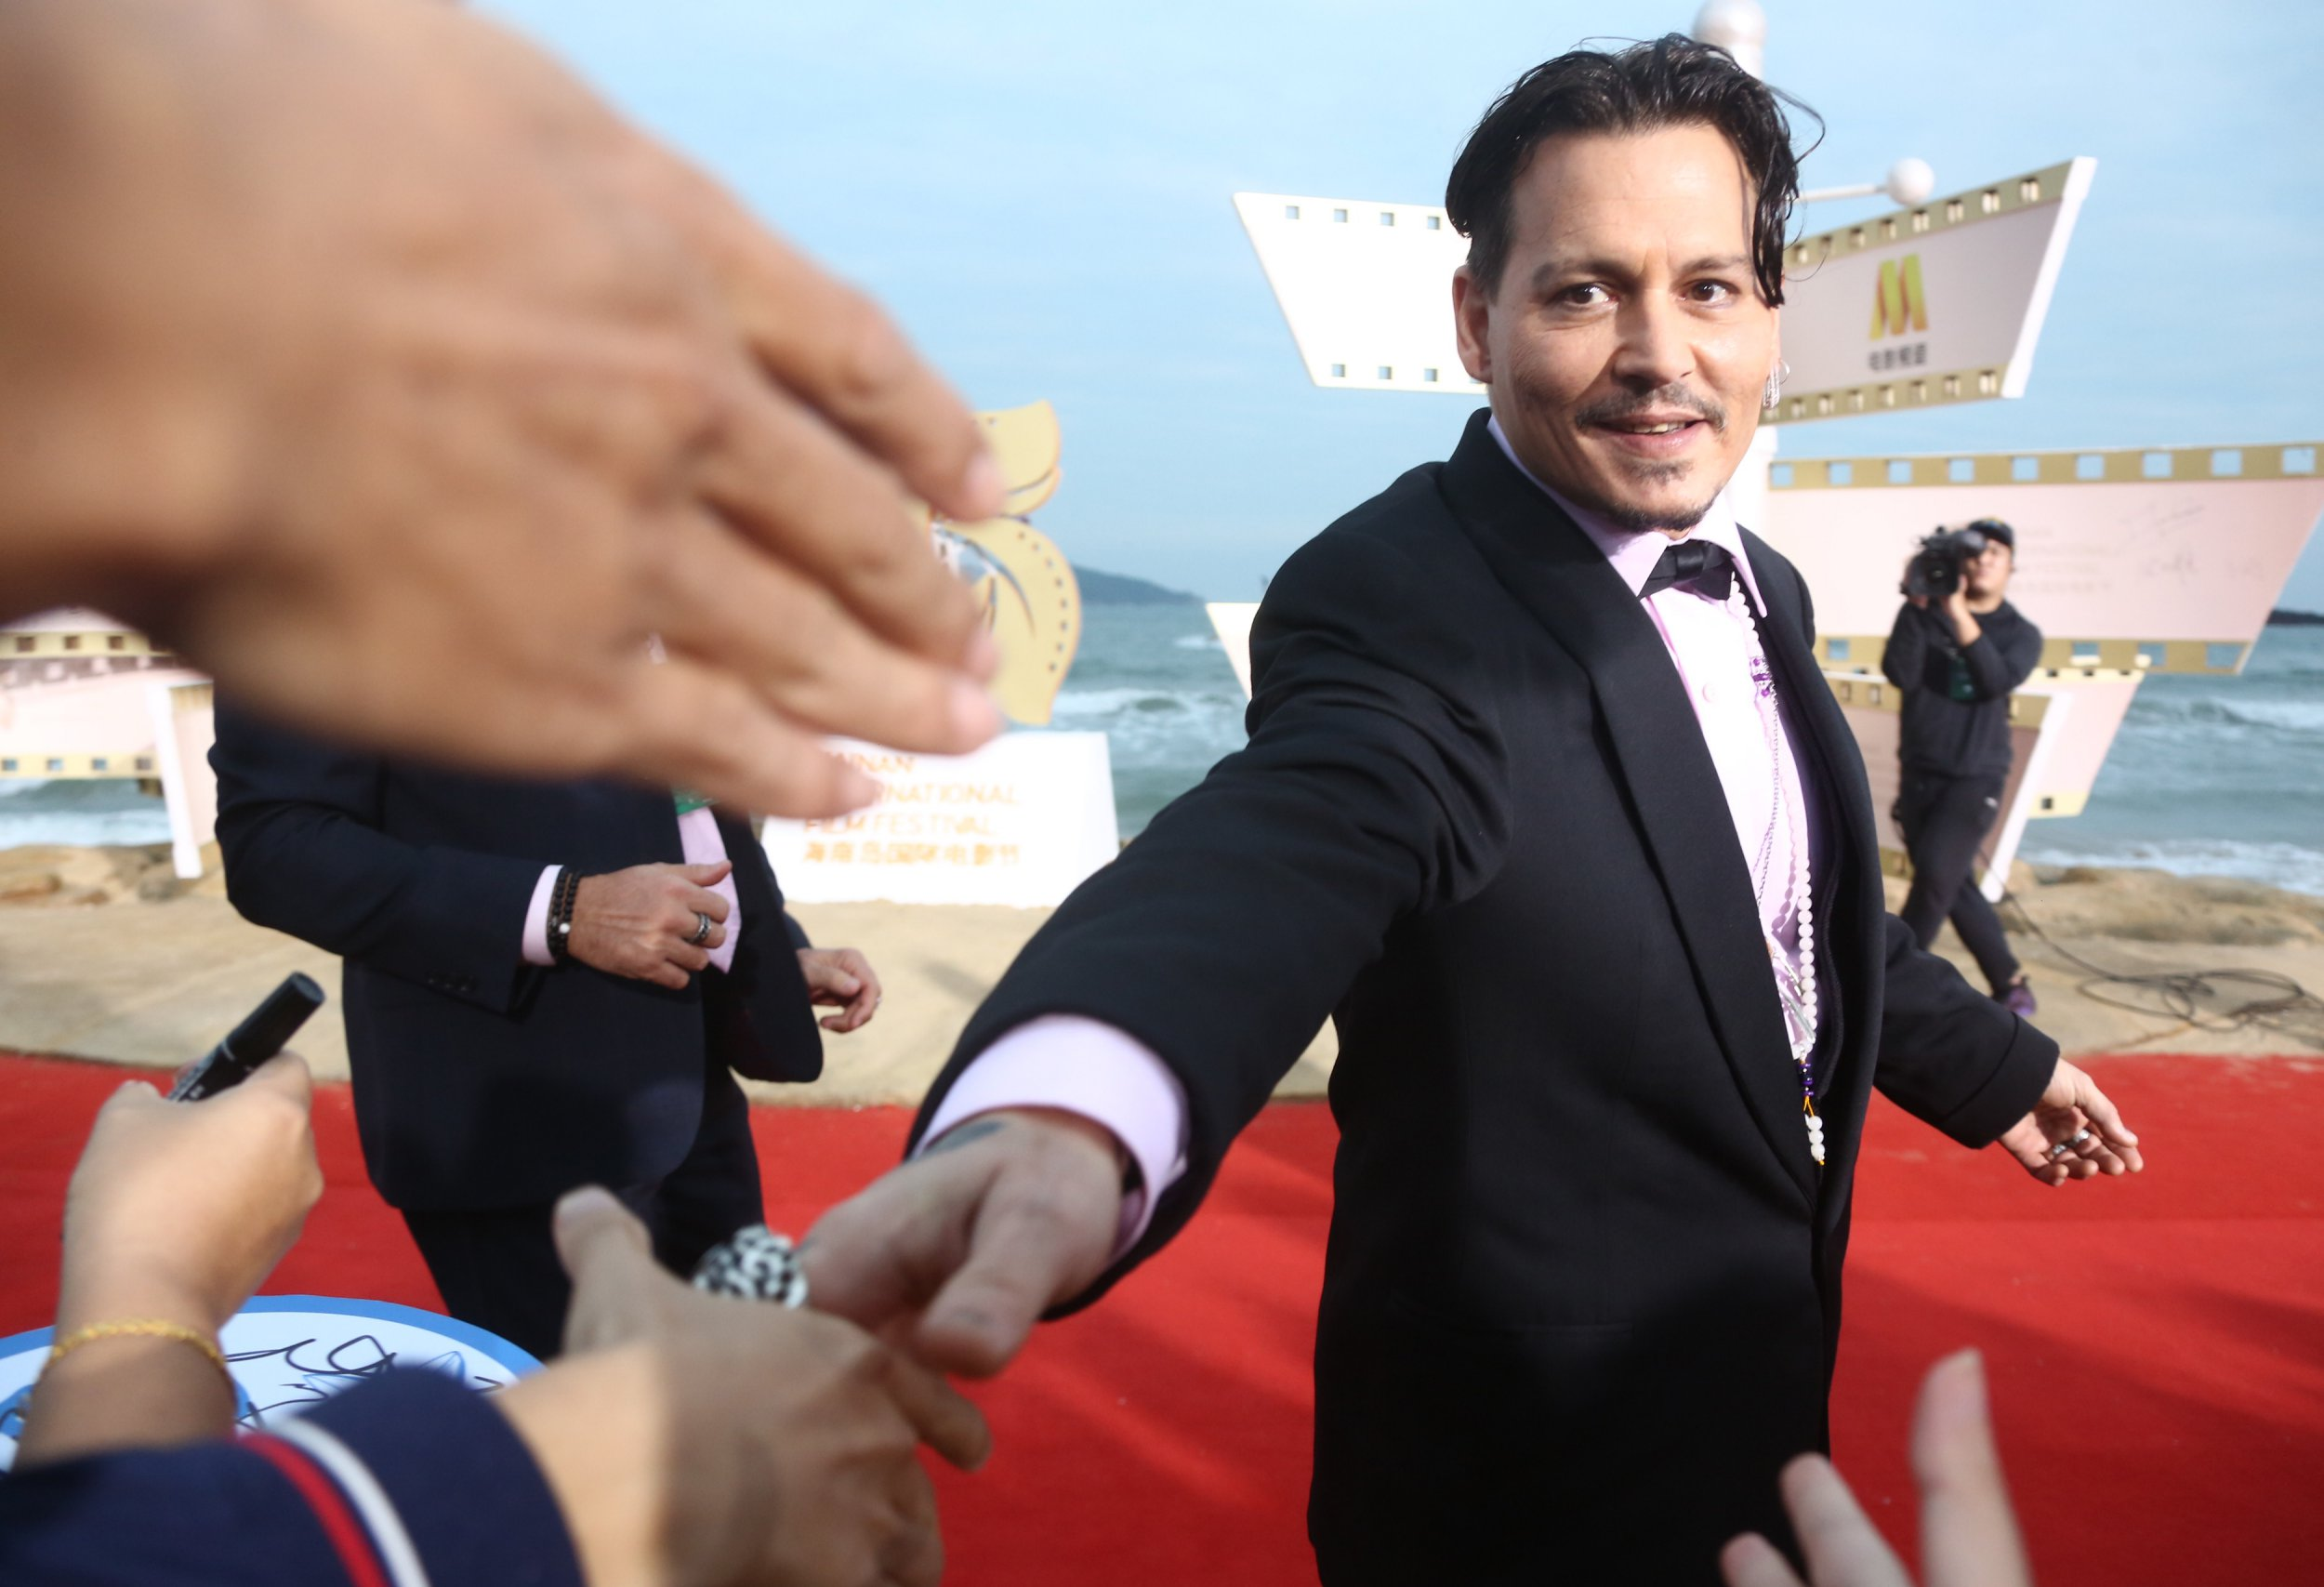 Johnny Depp looks sharp as he closes Hainan International Film Festival